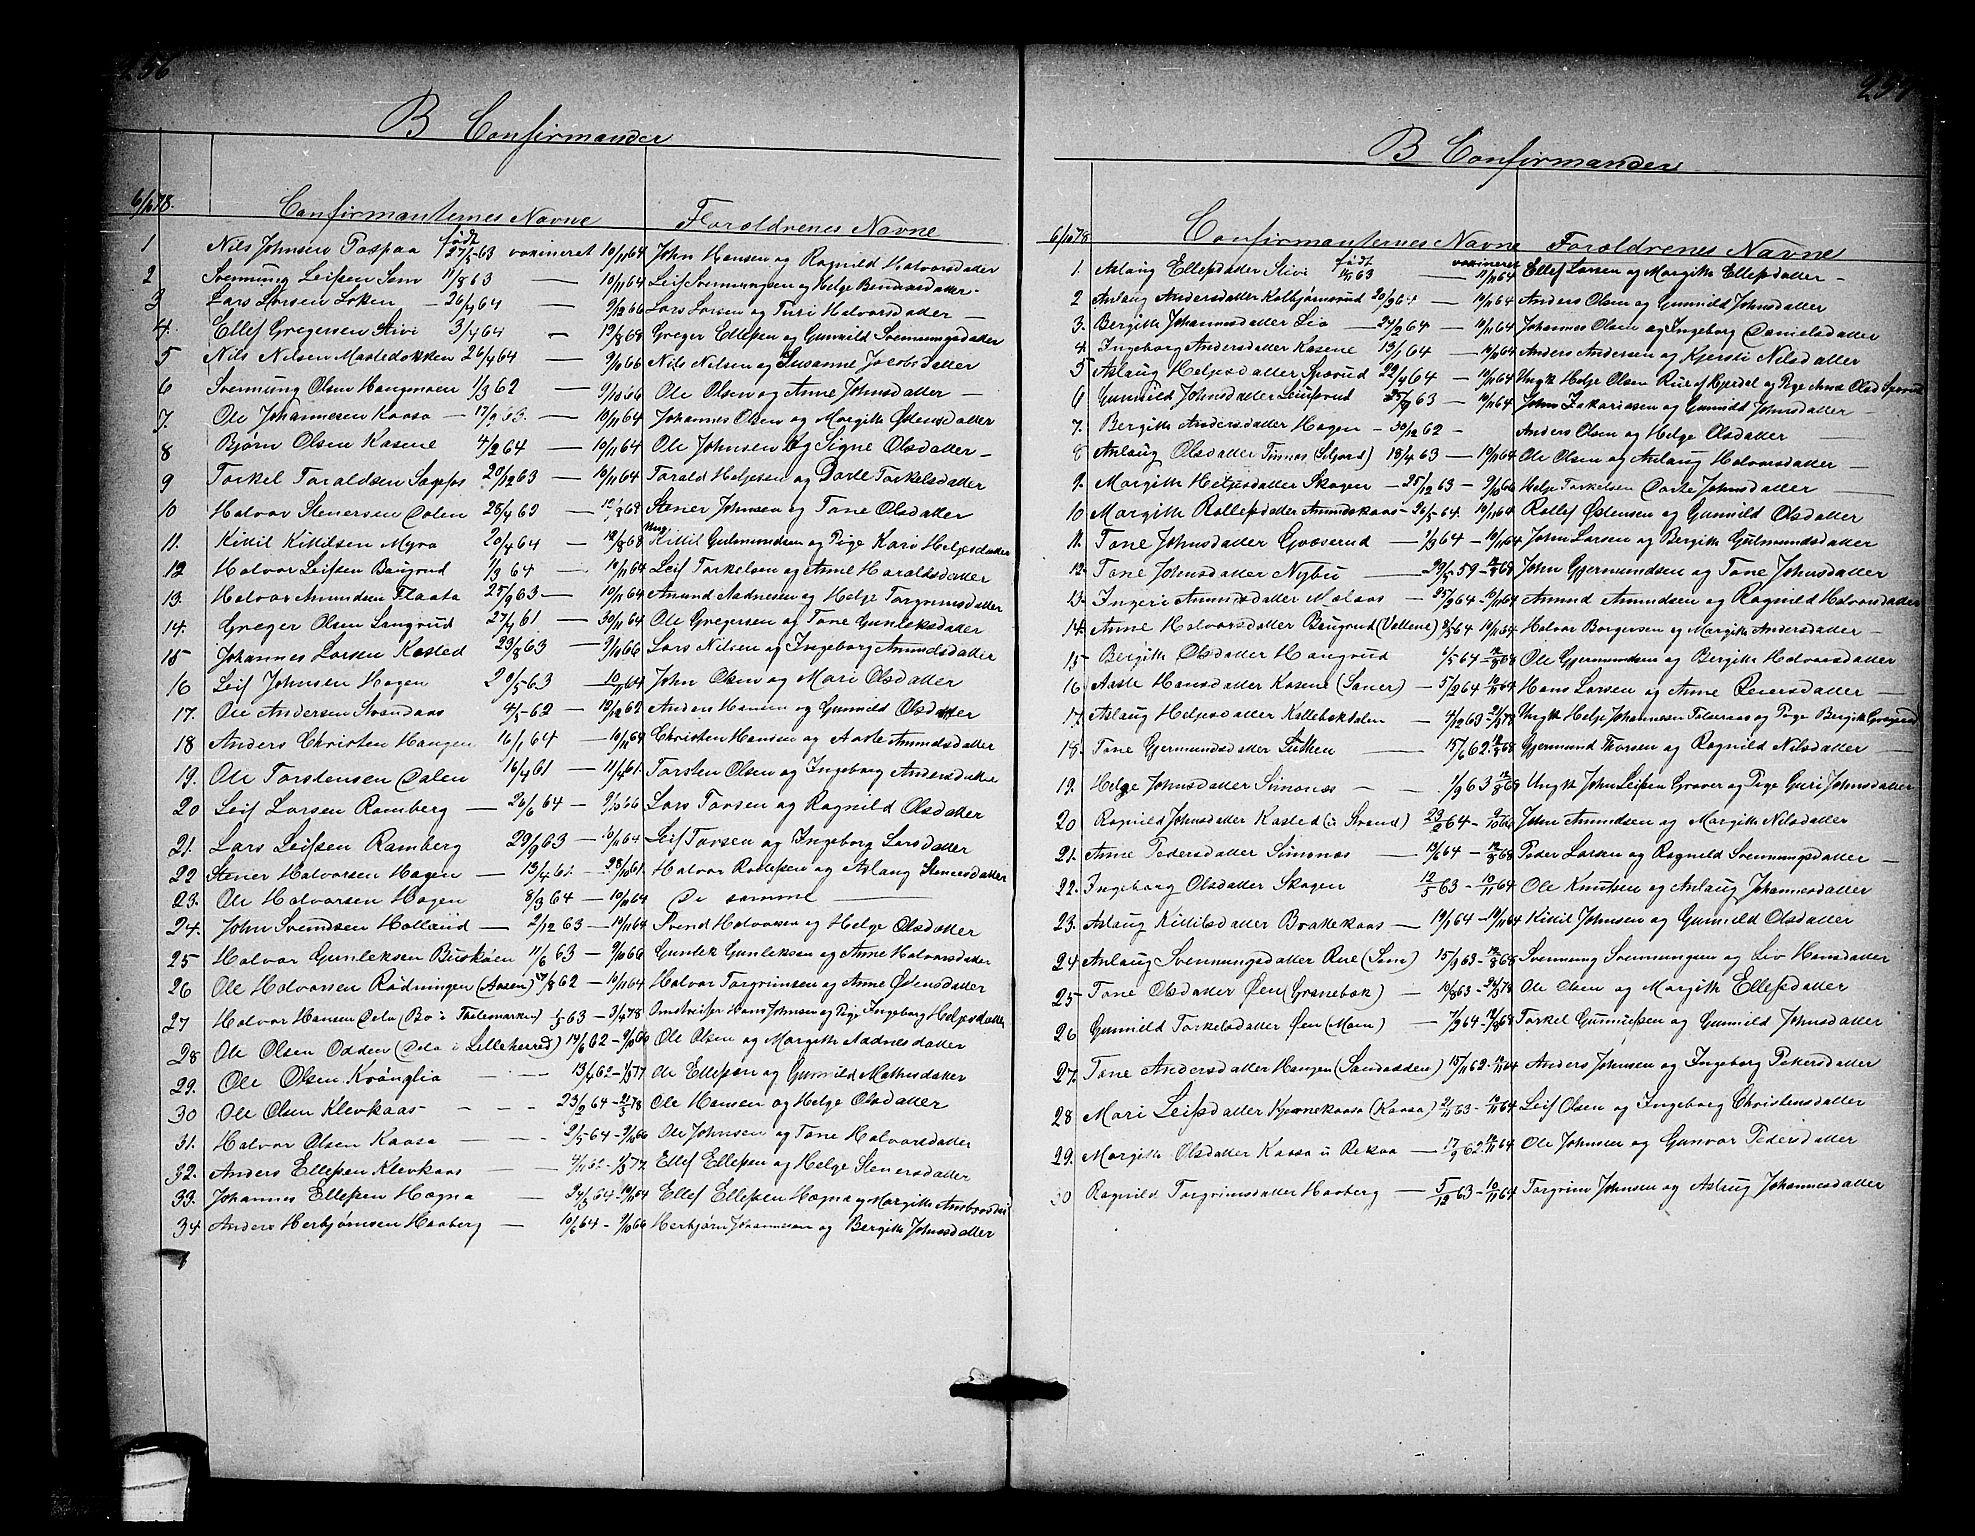 SAKO, Heddal kirkebøker, G/Ga/L0001: Klokkerbok nr. I 1, 1866-1878, s. 256-257